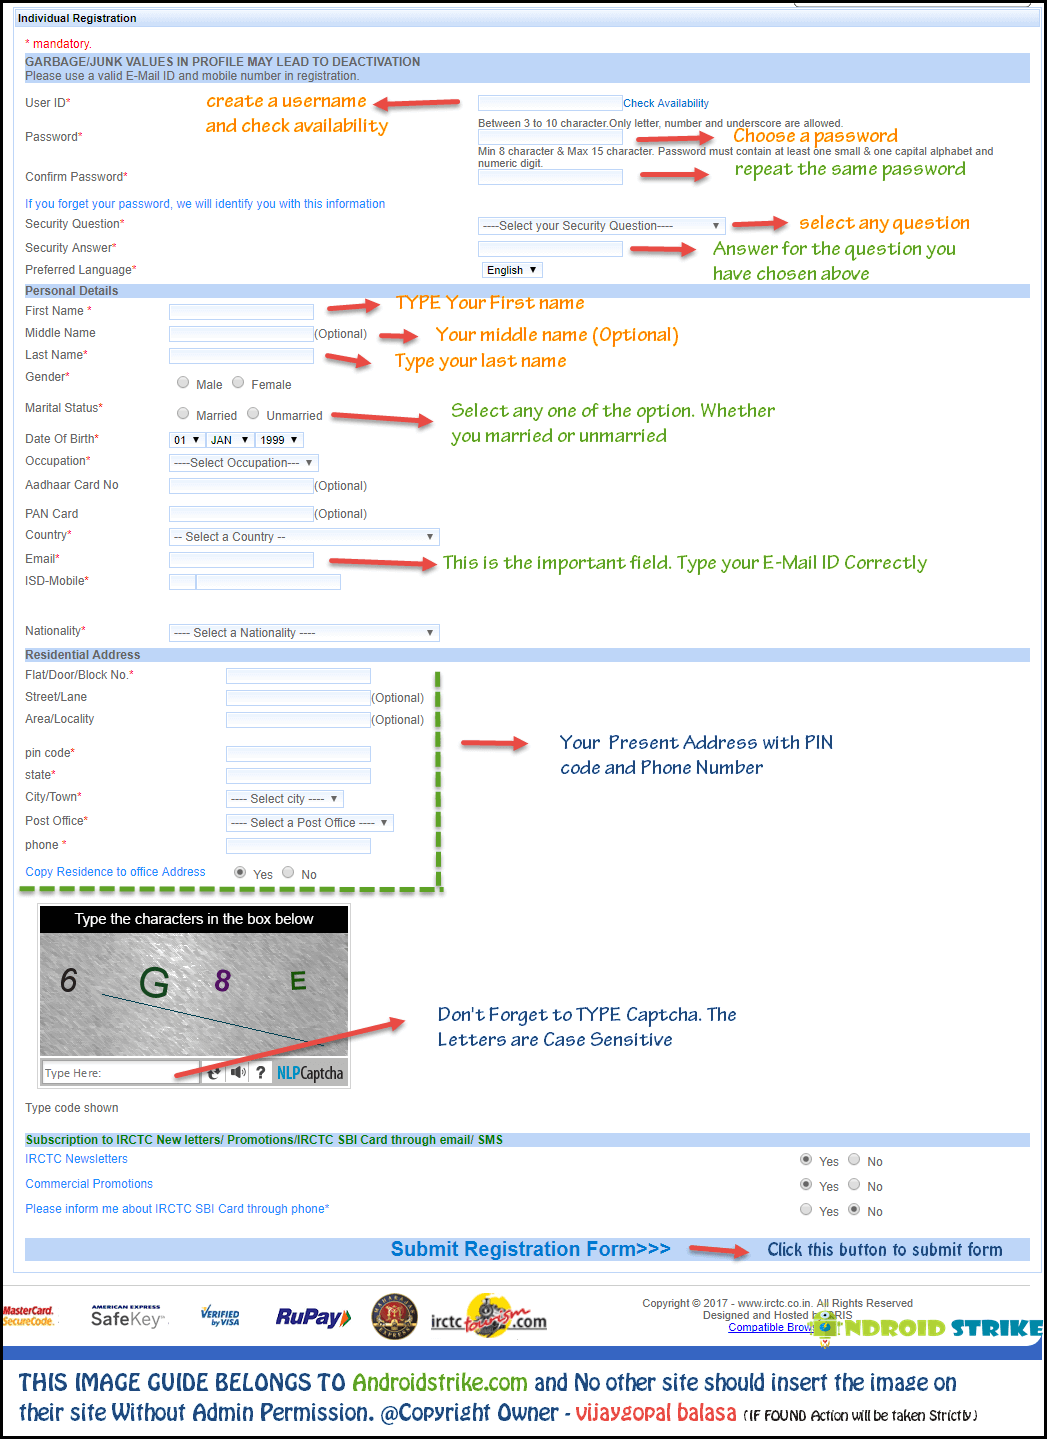 IRCTC Registration Form Guide